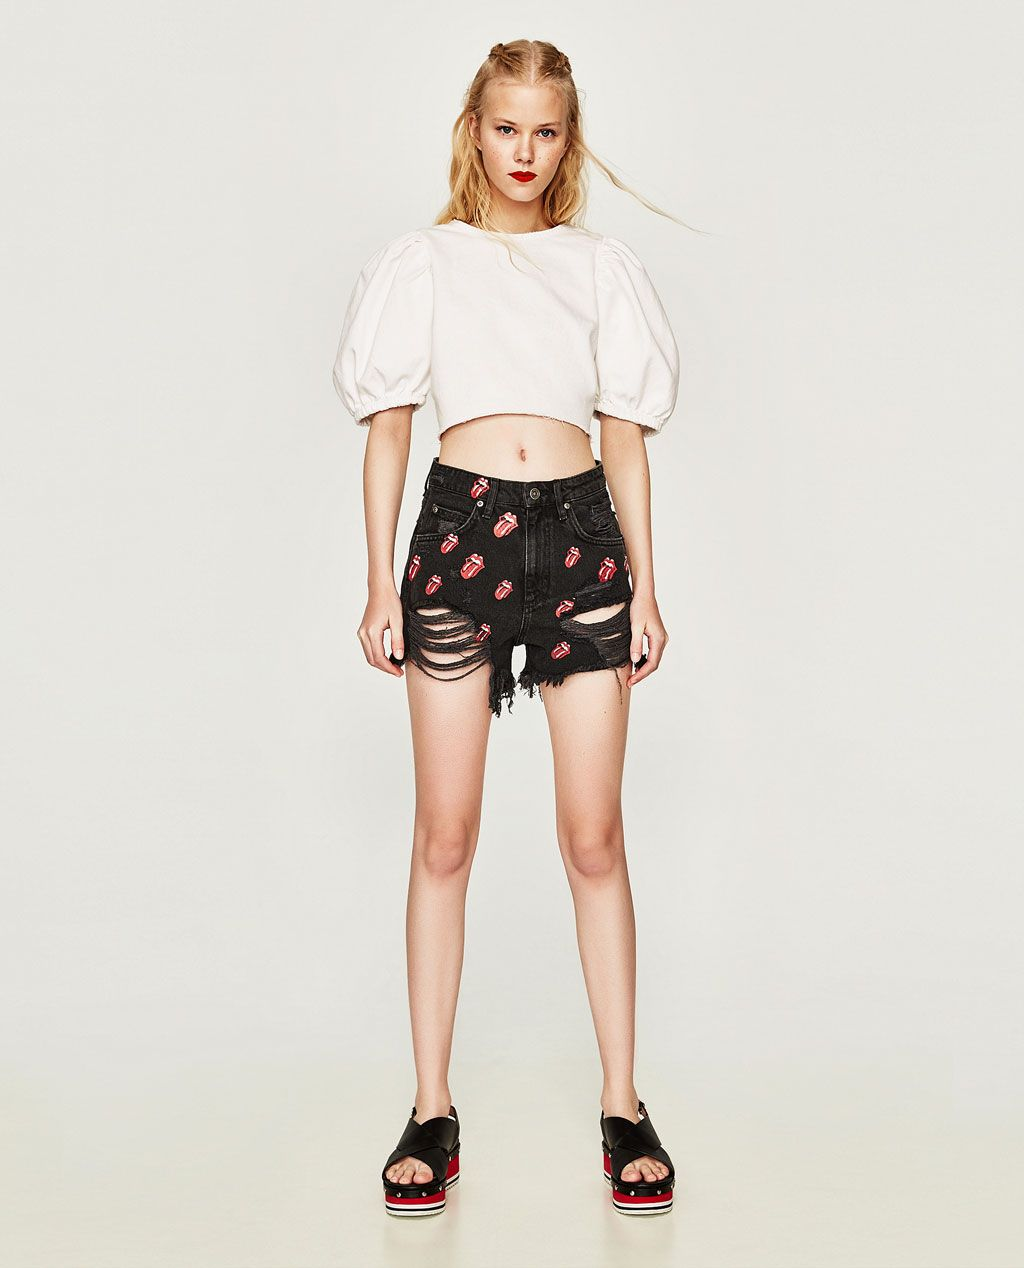 Holland Short   Lace shorts, Gym shorts womens, Gym women